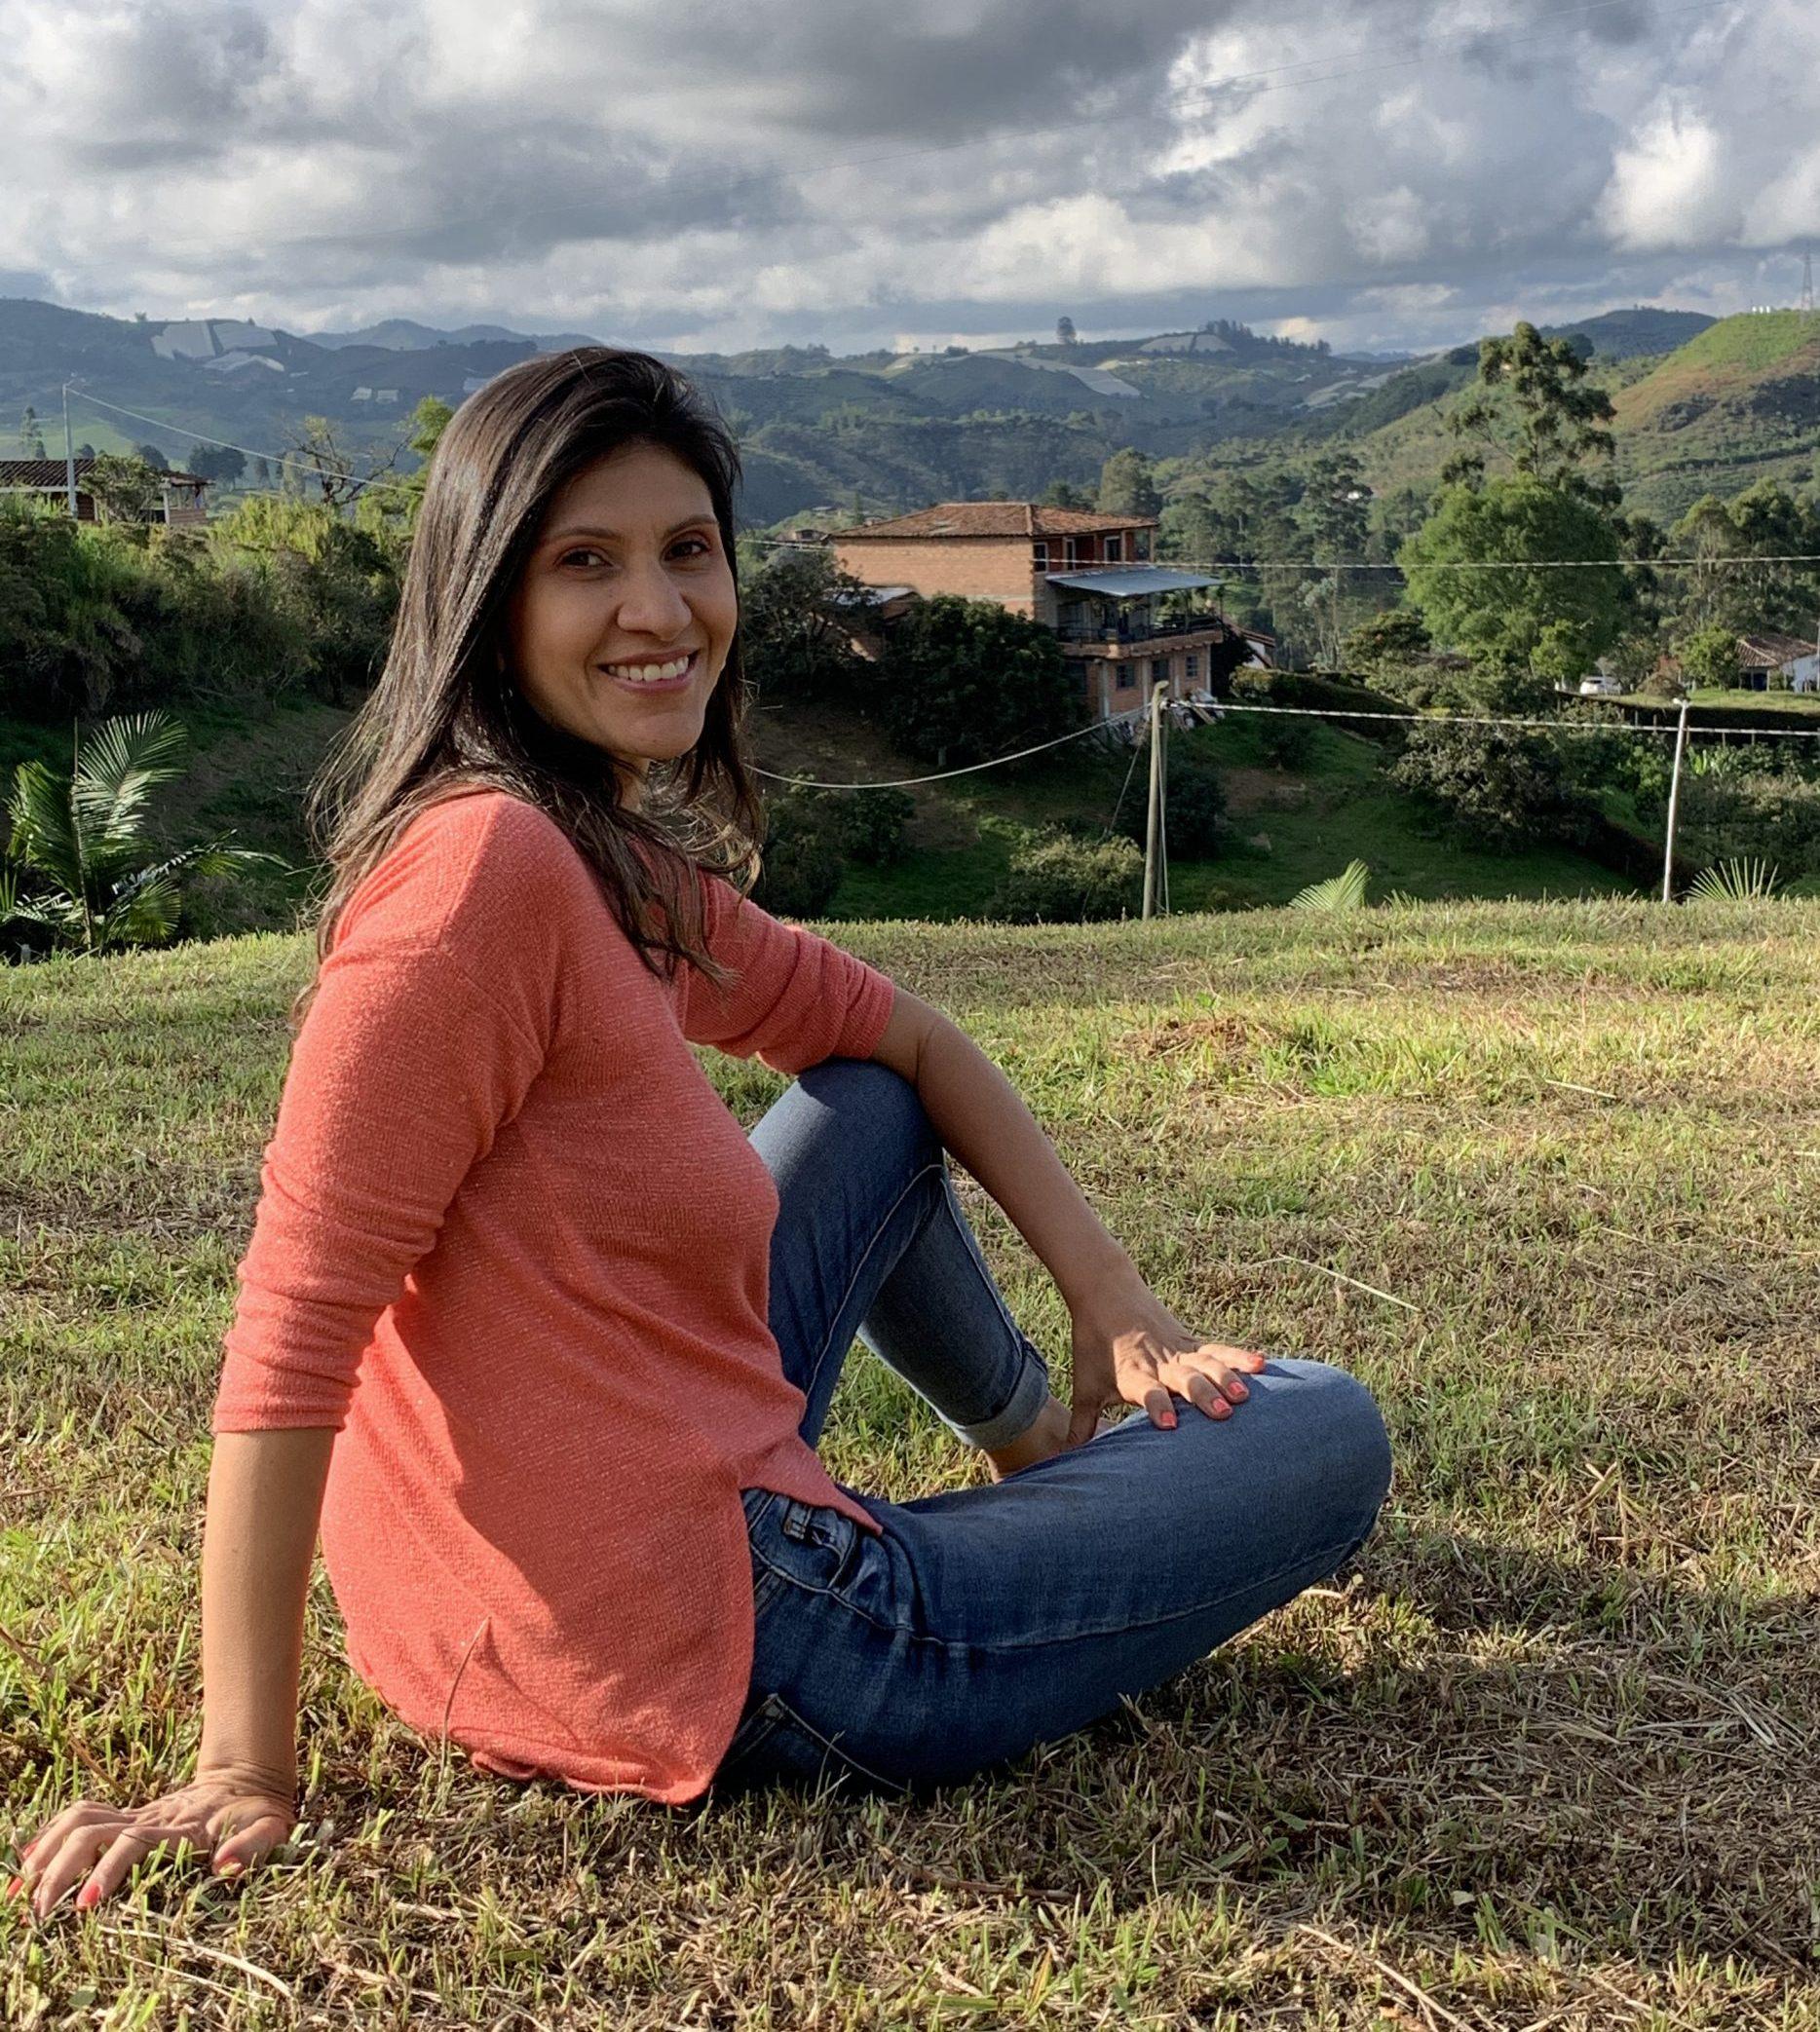 Anabel-hernandez-psicologa-infantil-Medellin-Colombia-crianza-respetuosa (4)